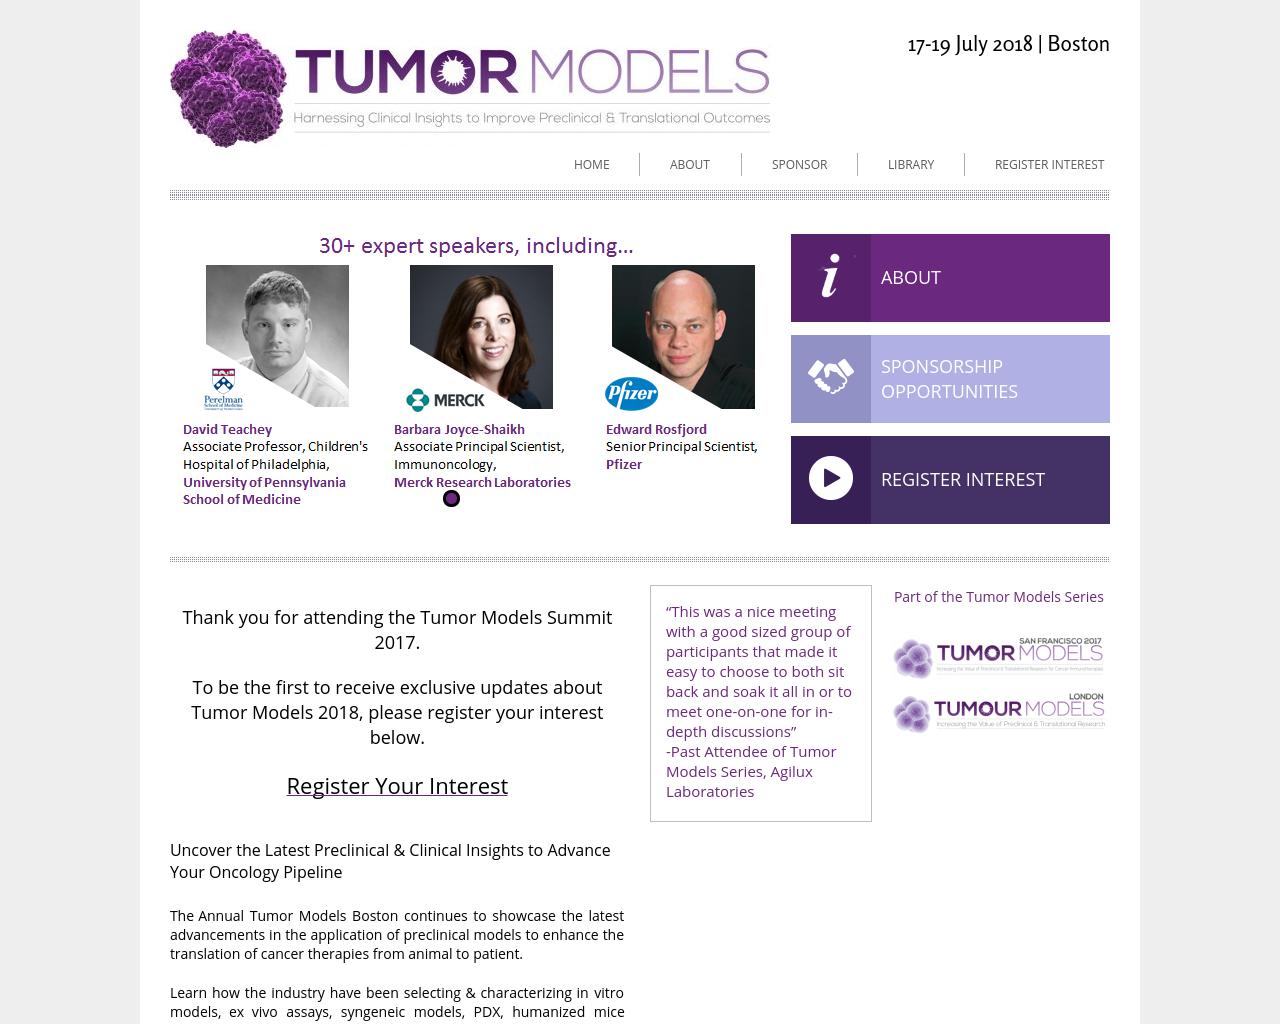 Tumor-models.com-Advertising-Reviews-Pricing